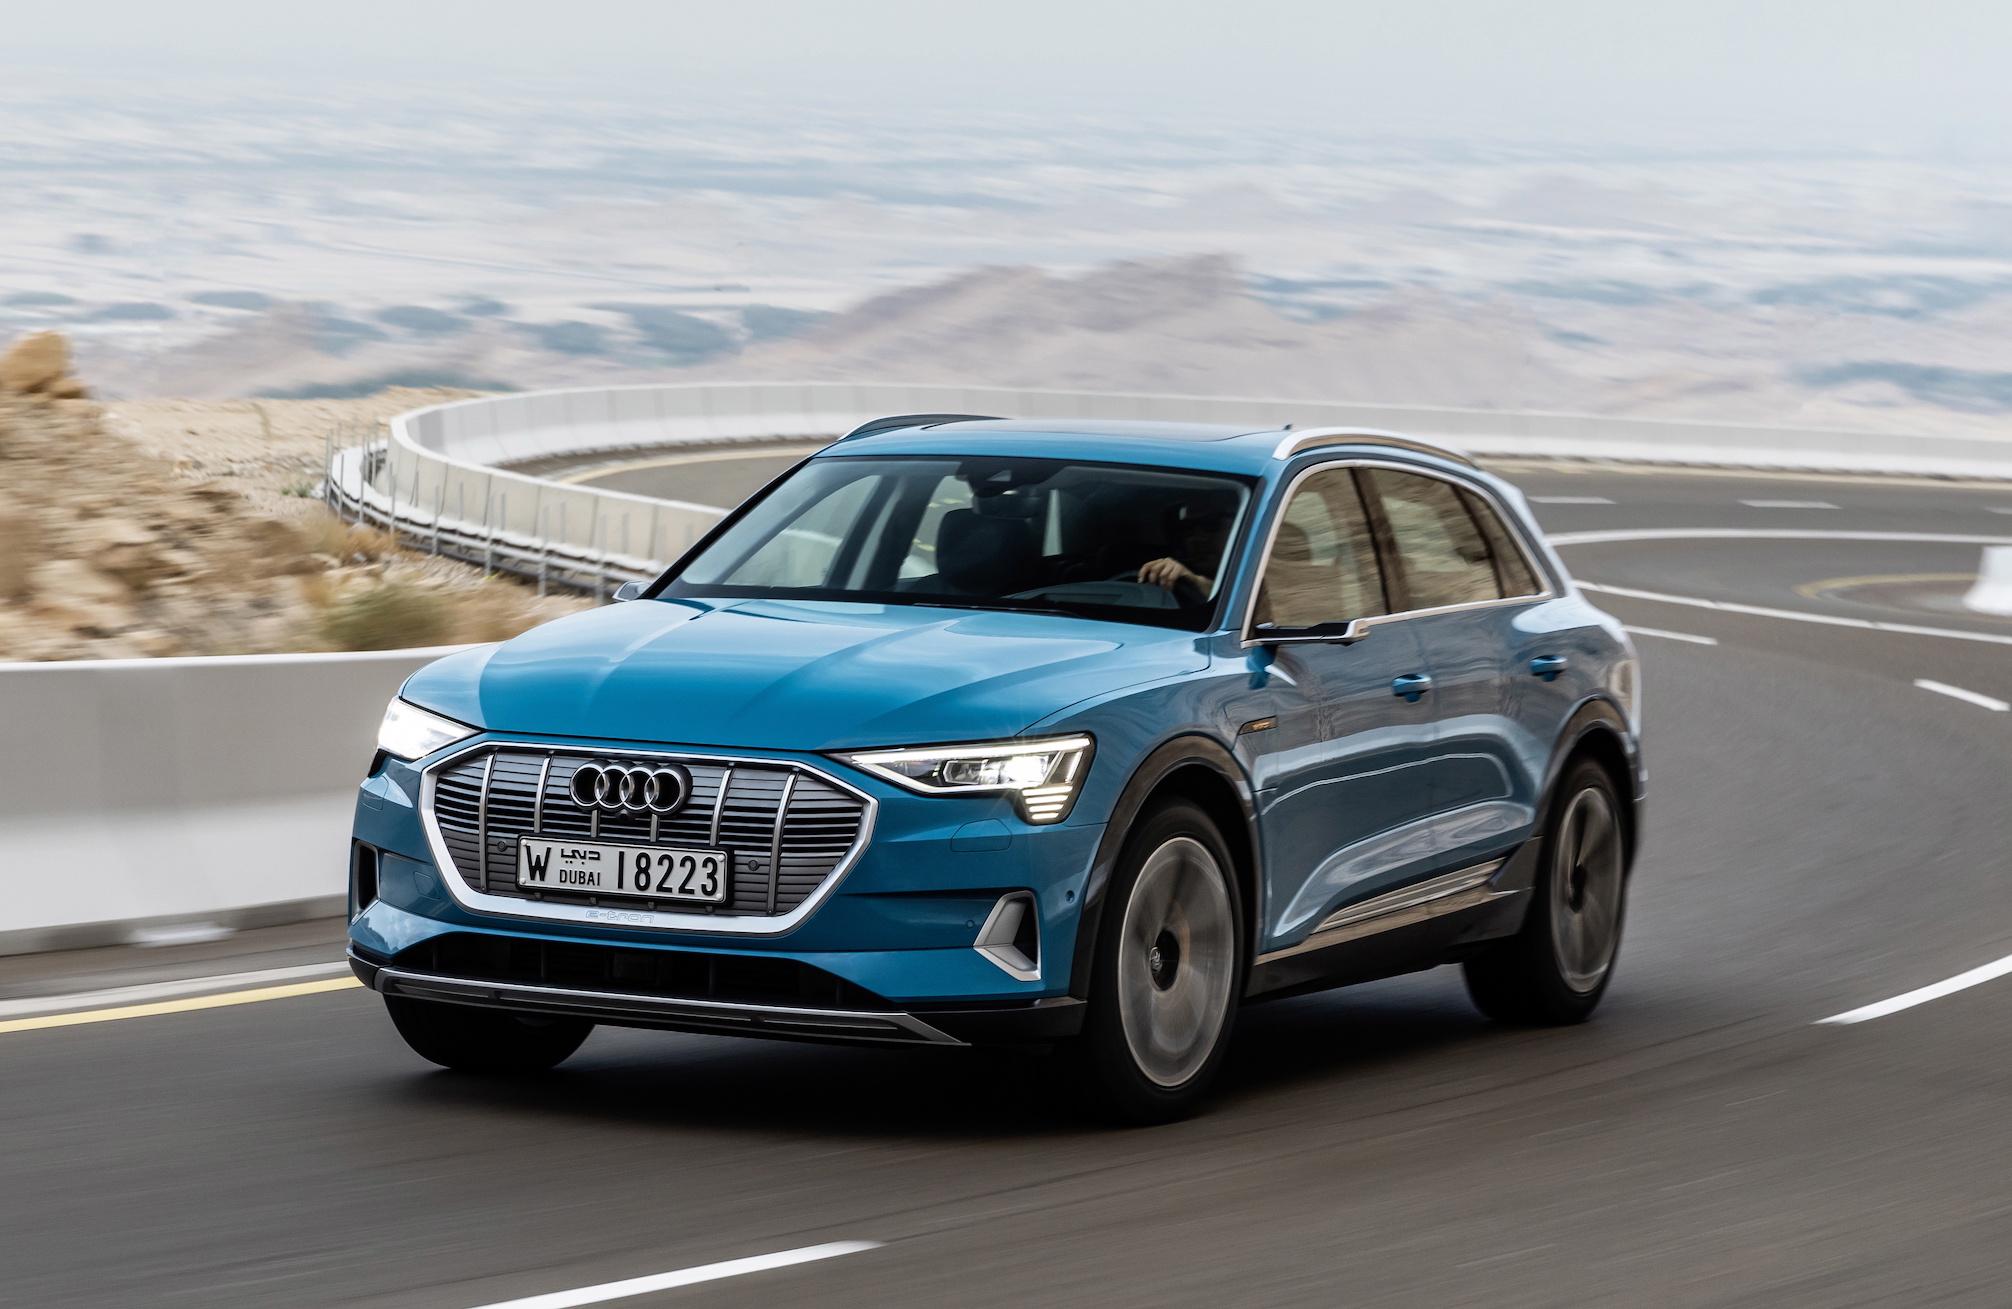 2019-Audi-etron-blue